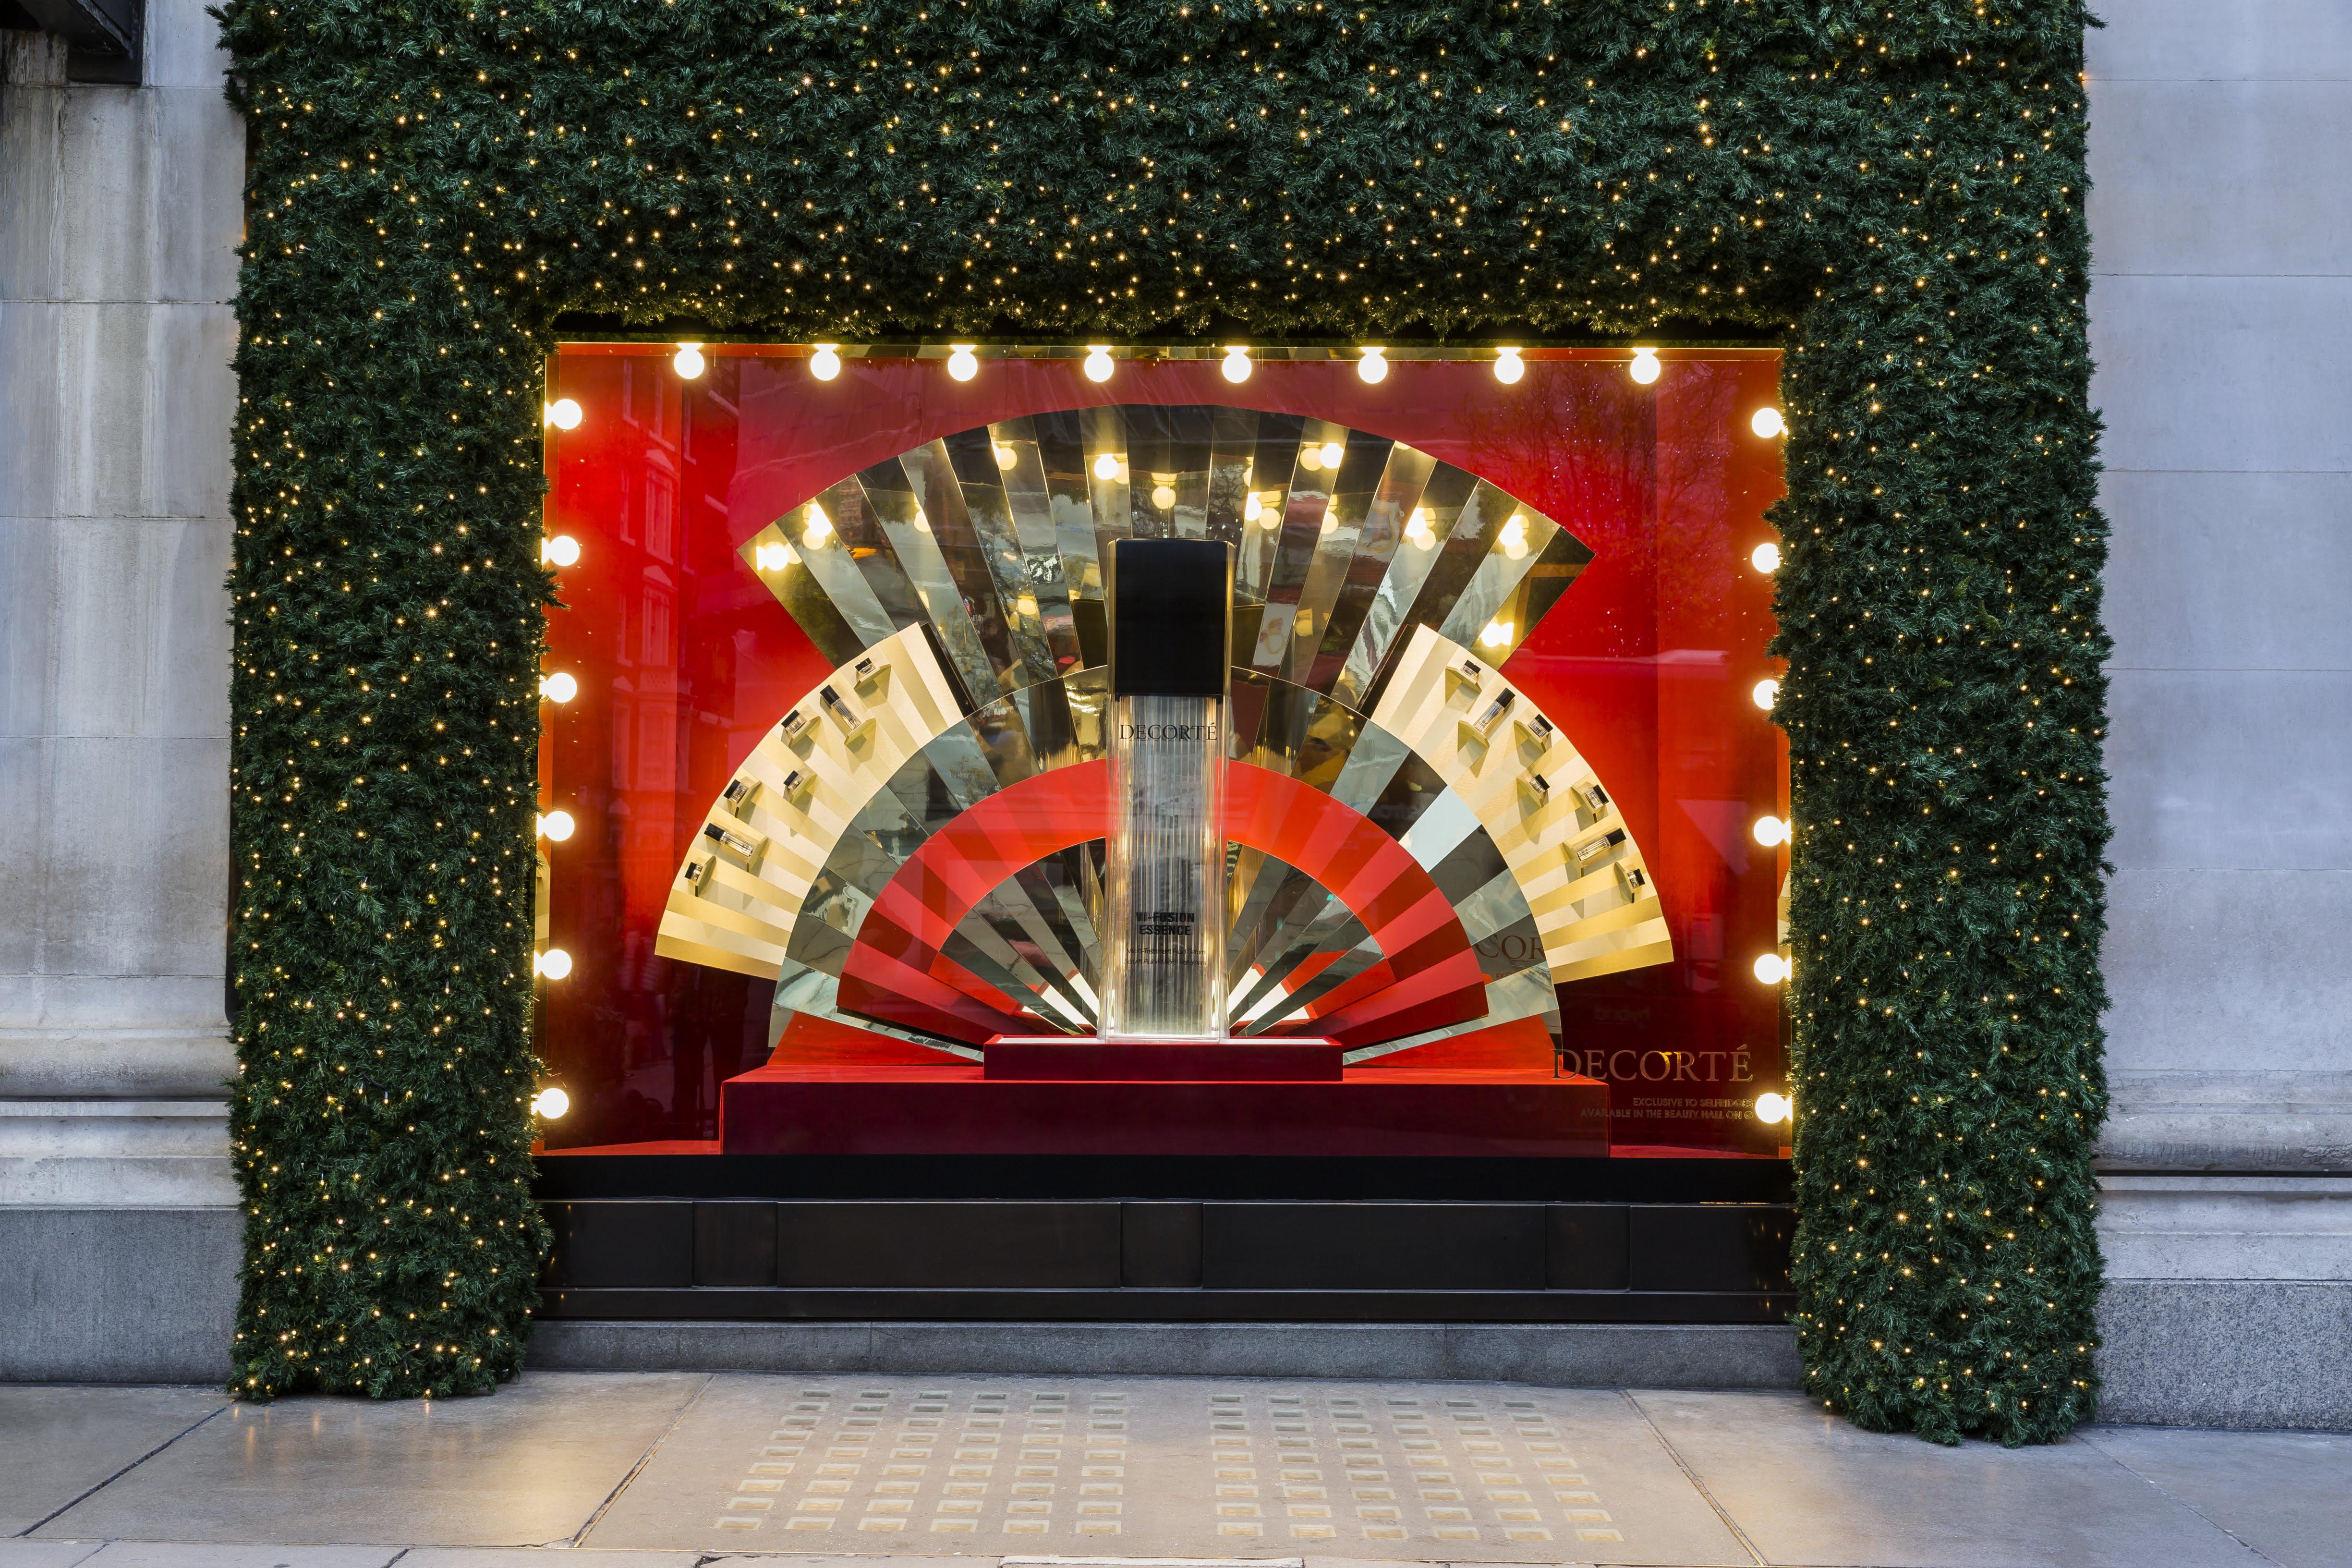 Justin Focus Technical Design - Selfridges Christmas Windows